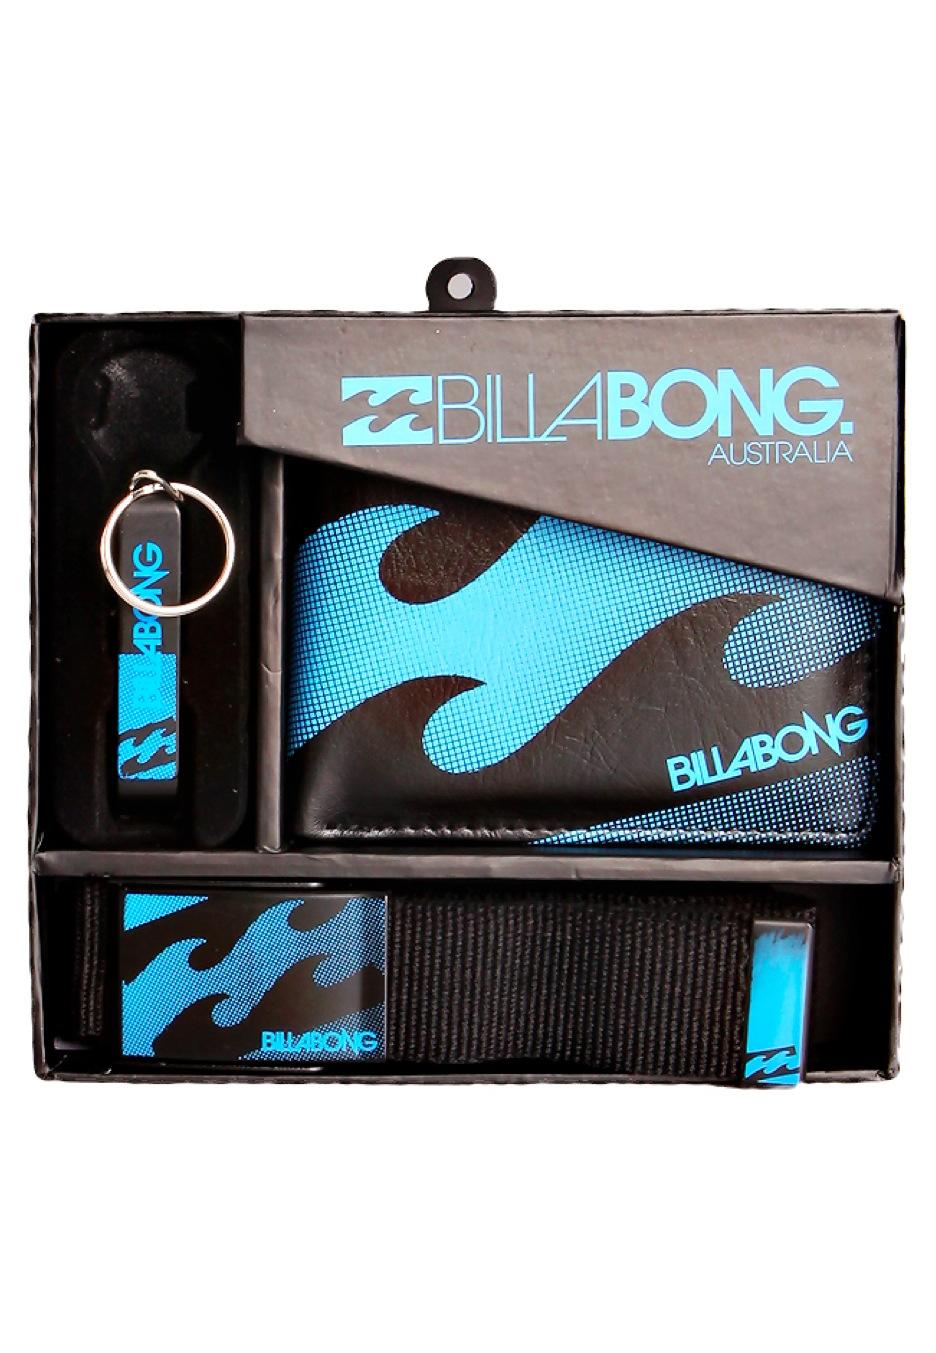 Billabong - Deluxe Ocean Blue - Gift Pack - Streetwear Shop - Impericon.com  Worldwide fdc1f23ead8ab